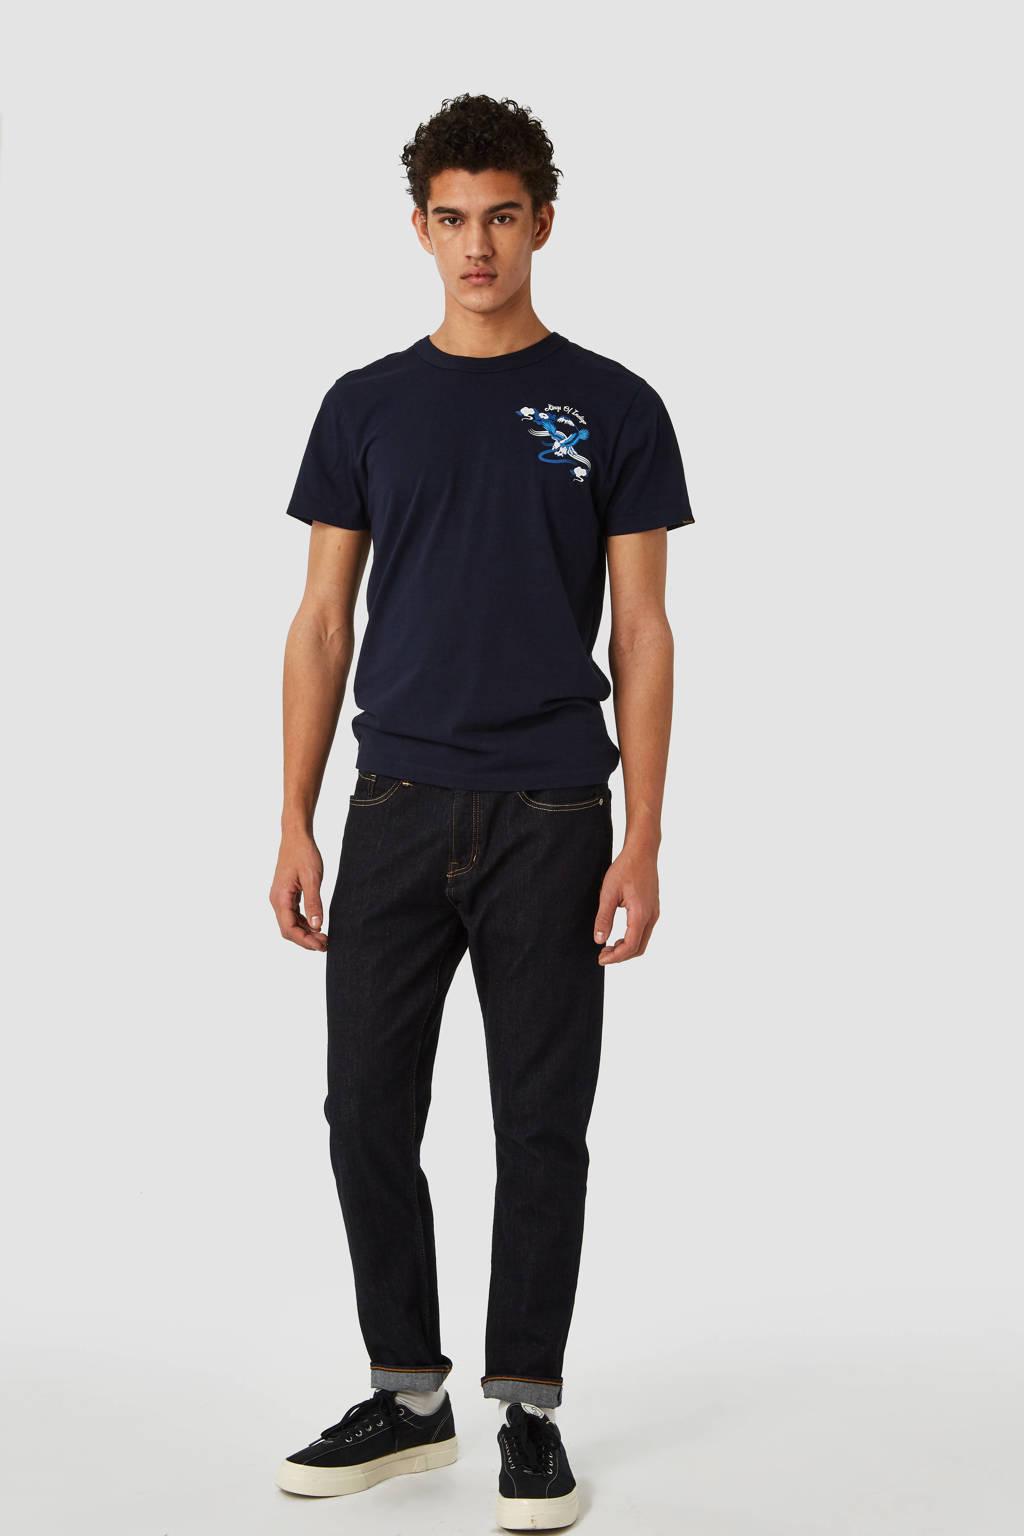 Kings of Indigo T-shirt met printopdruk donkerblauw, Donkerblauw